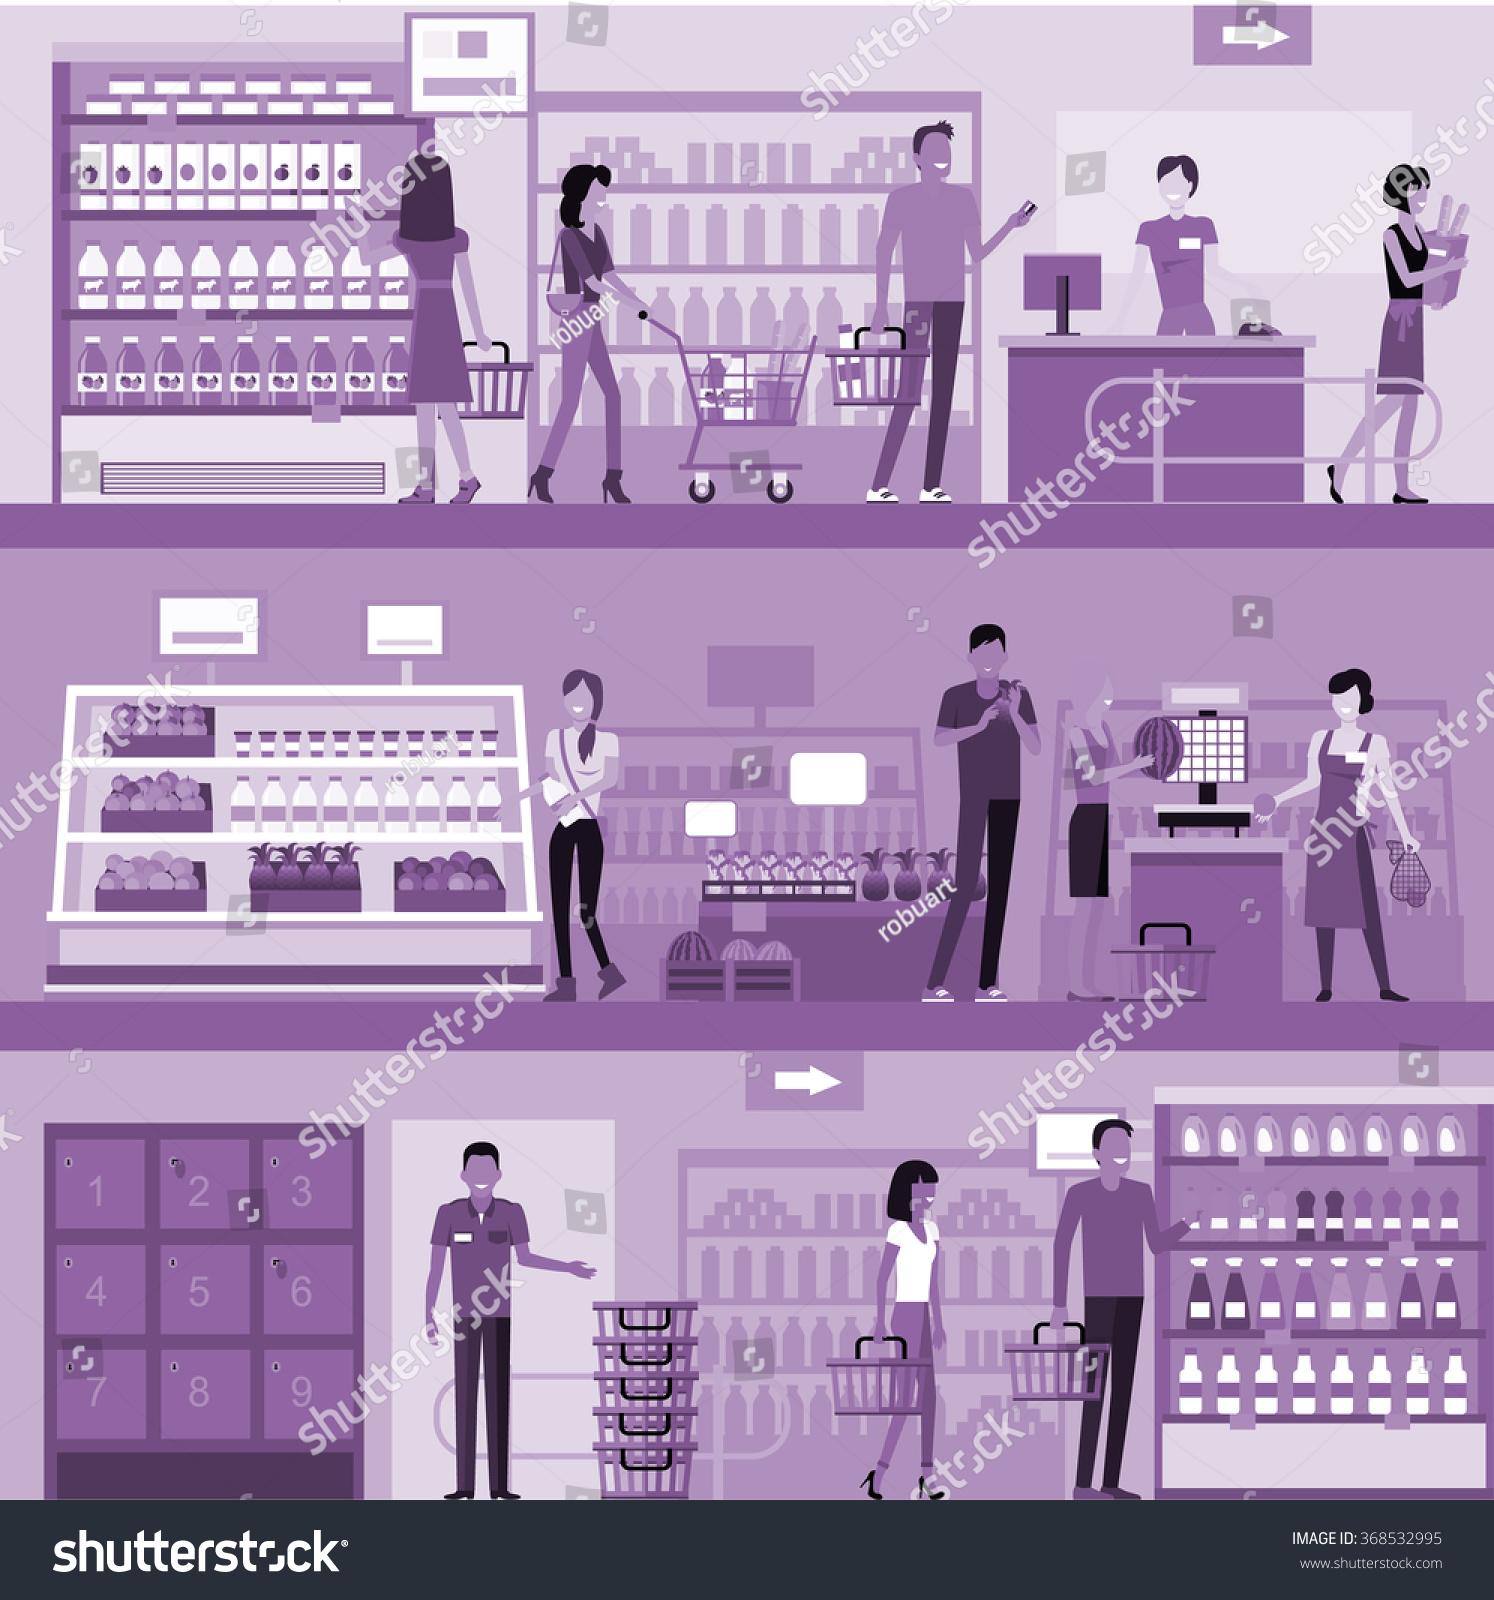 People Supermarket Interior Design People Shopping Stock